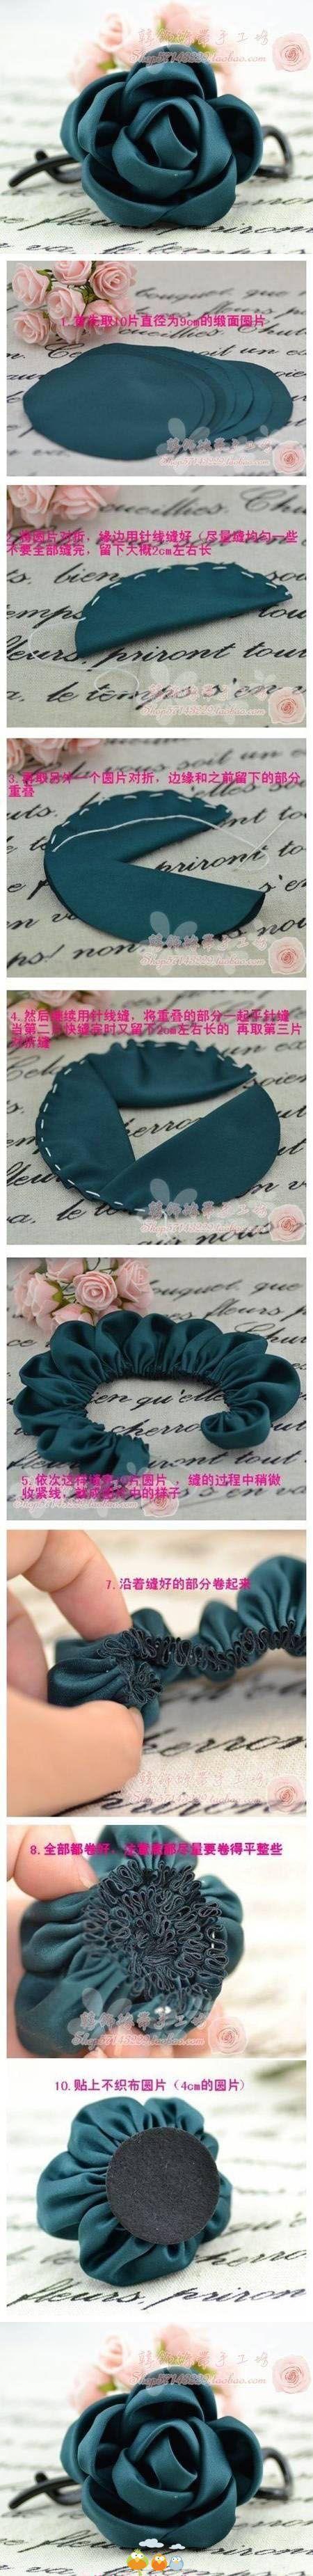 DIY Fabric Rose | | Keywords: diy, crafts, fabric rose, tutorial, how to